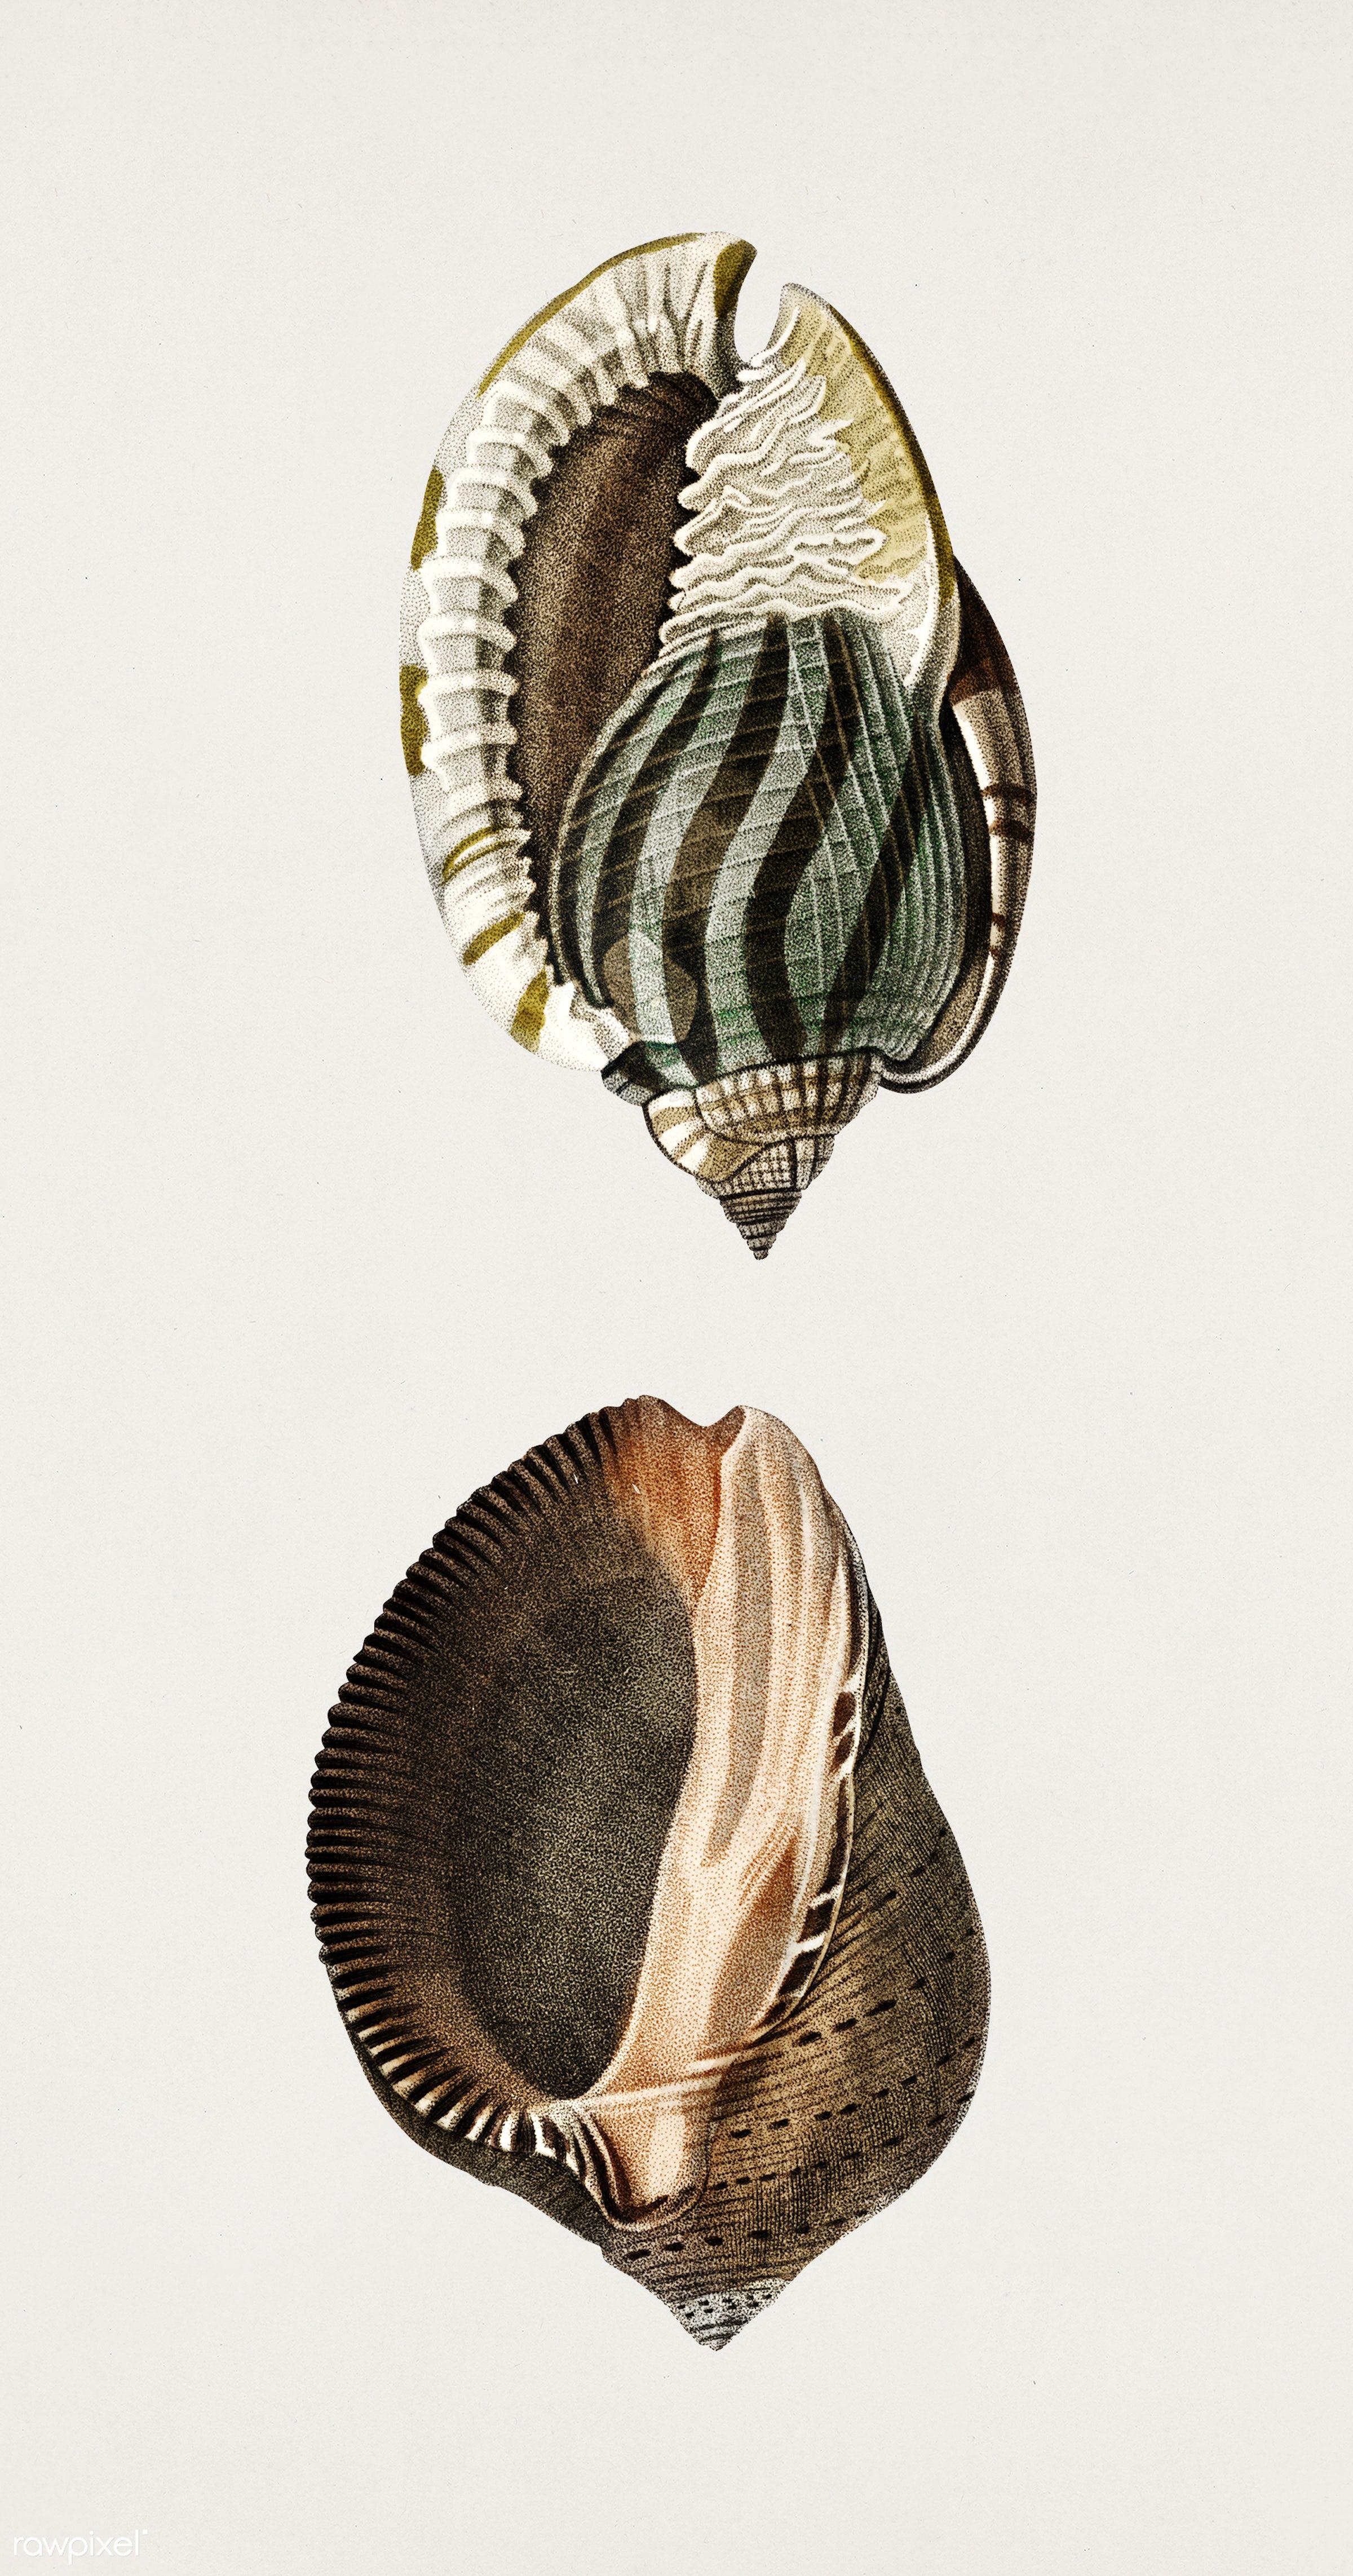 Striped bonnet (Cassis undata) and Persian purpura (Purpura persica) illustrated by Charles Dessalines D' Orbigny (1806-...